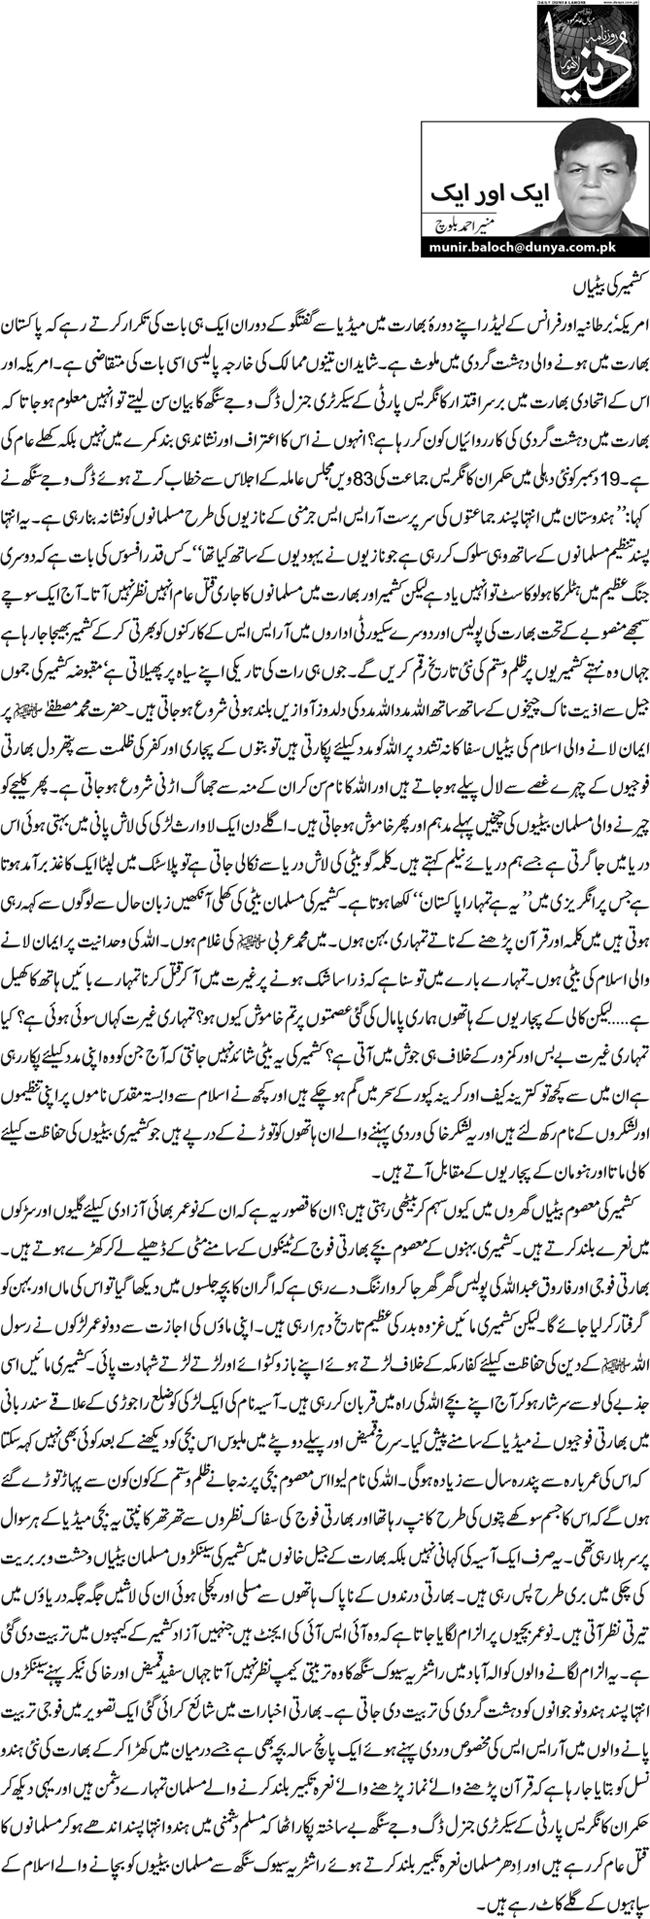 Kashmir ki baitian - Munir Ahmed Baloch